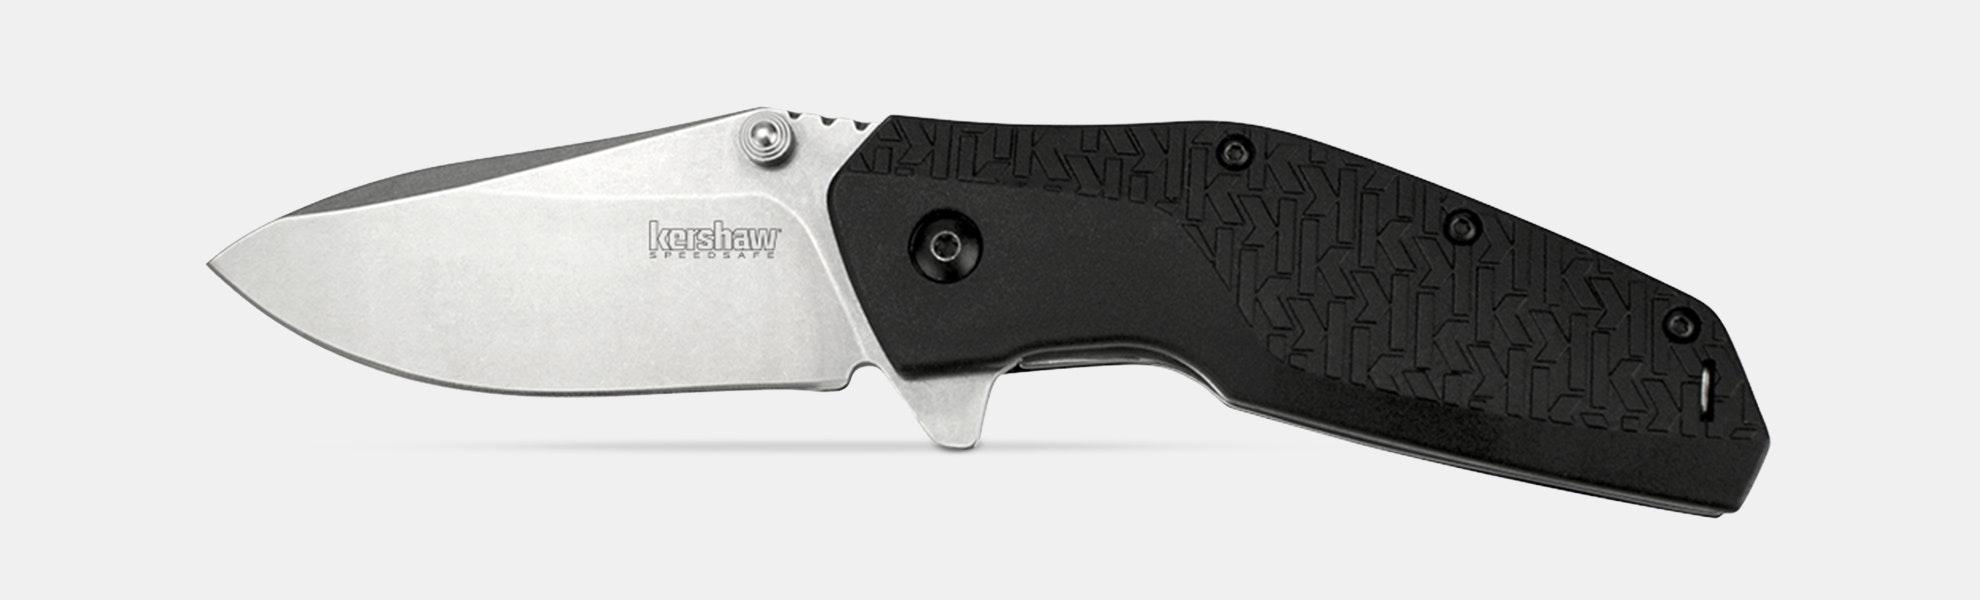 Kershaw Swerve Knife With SpeedSafe